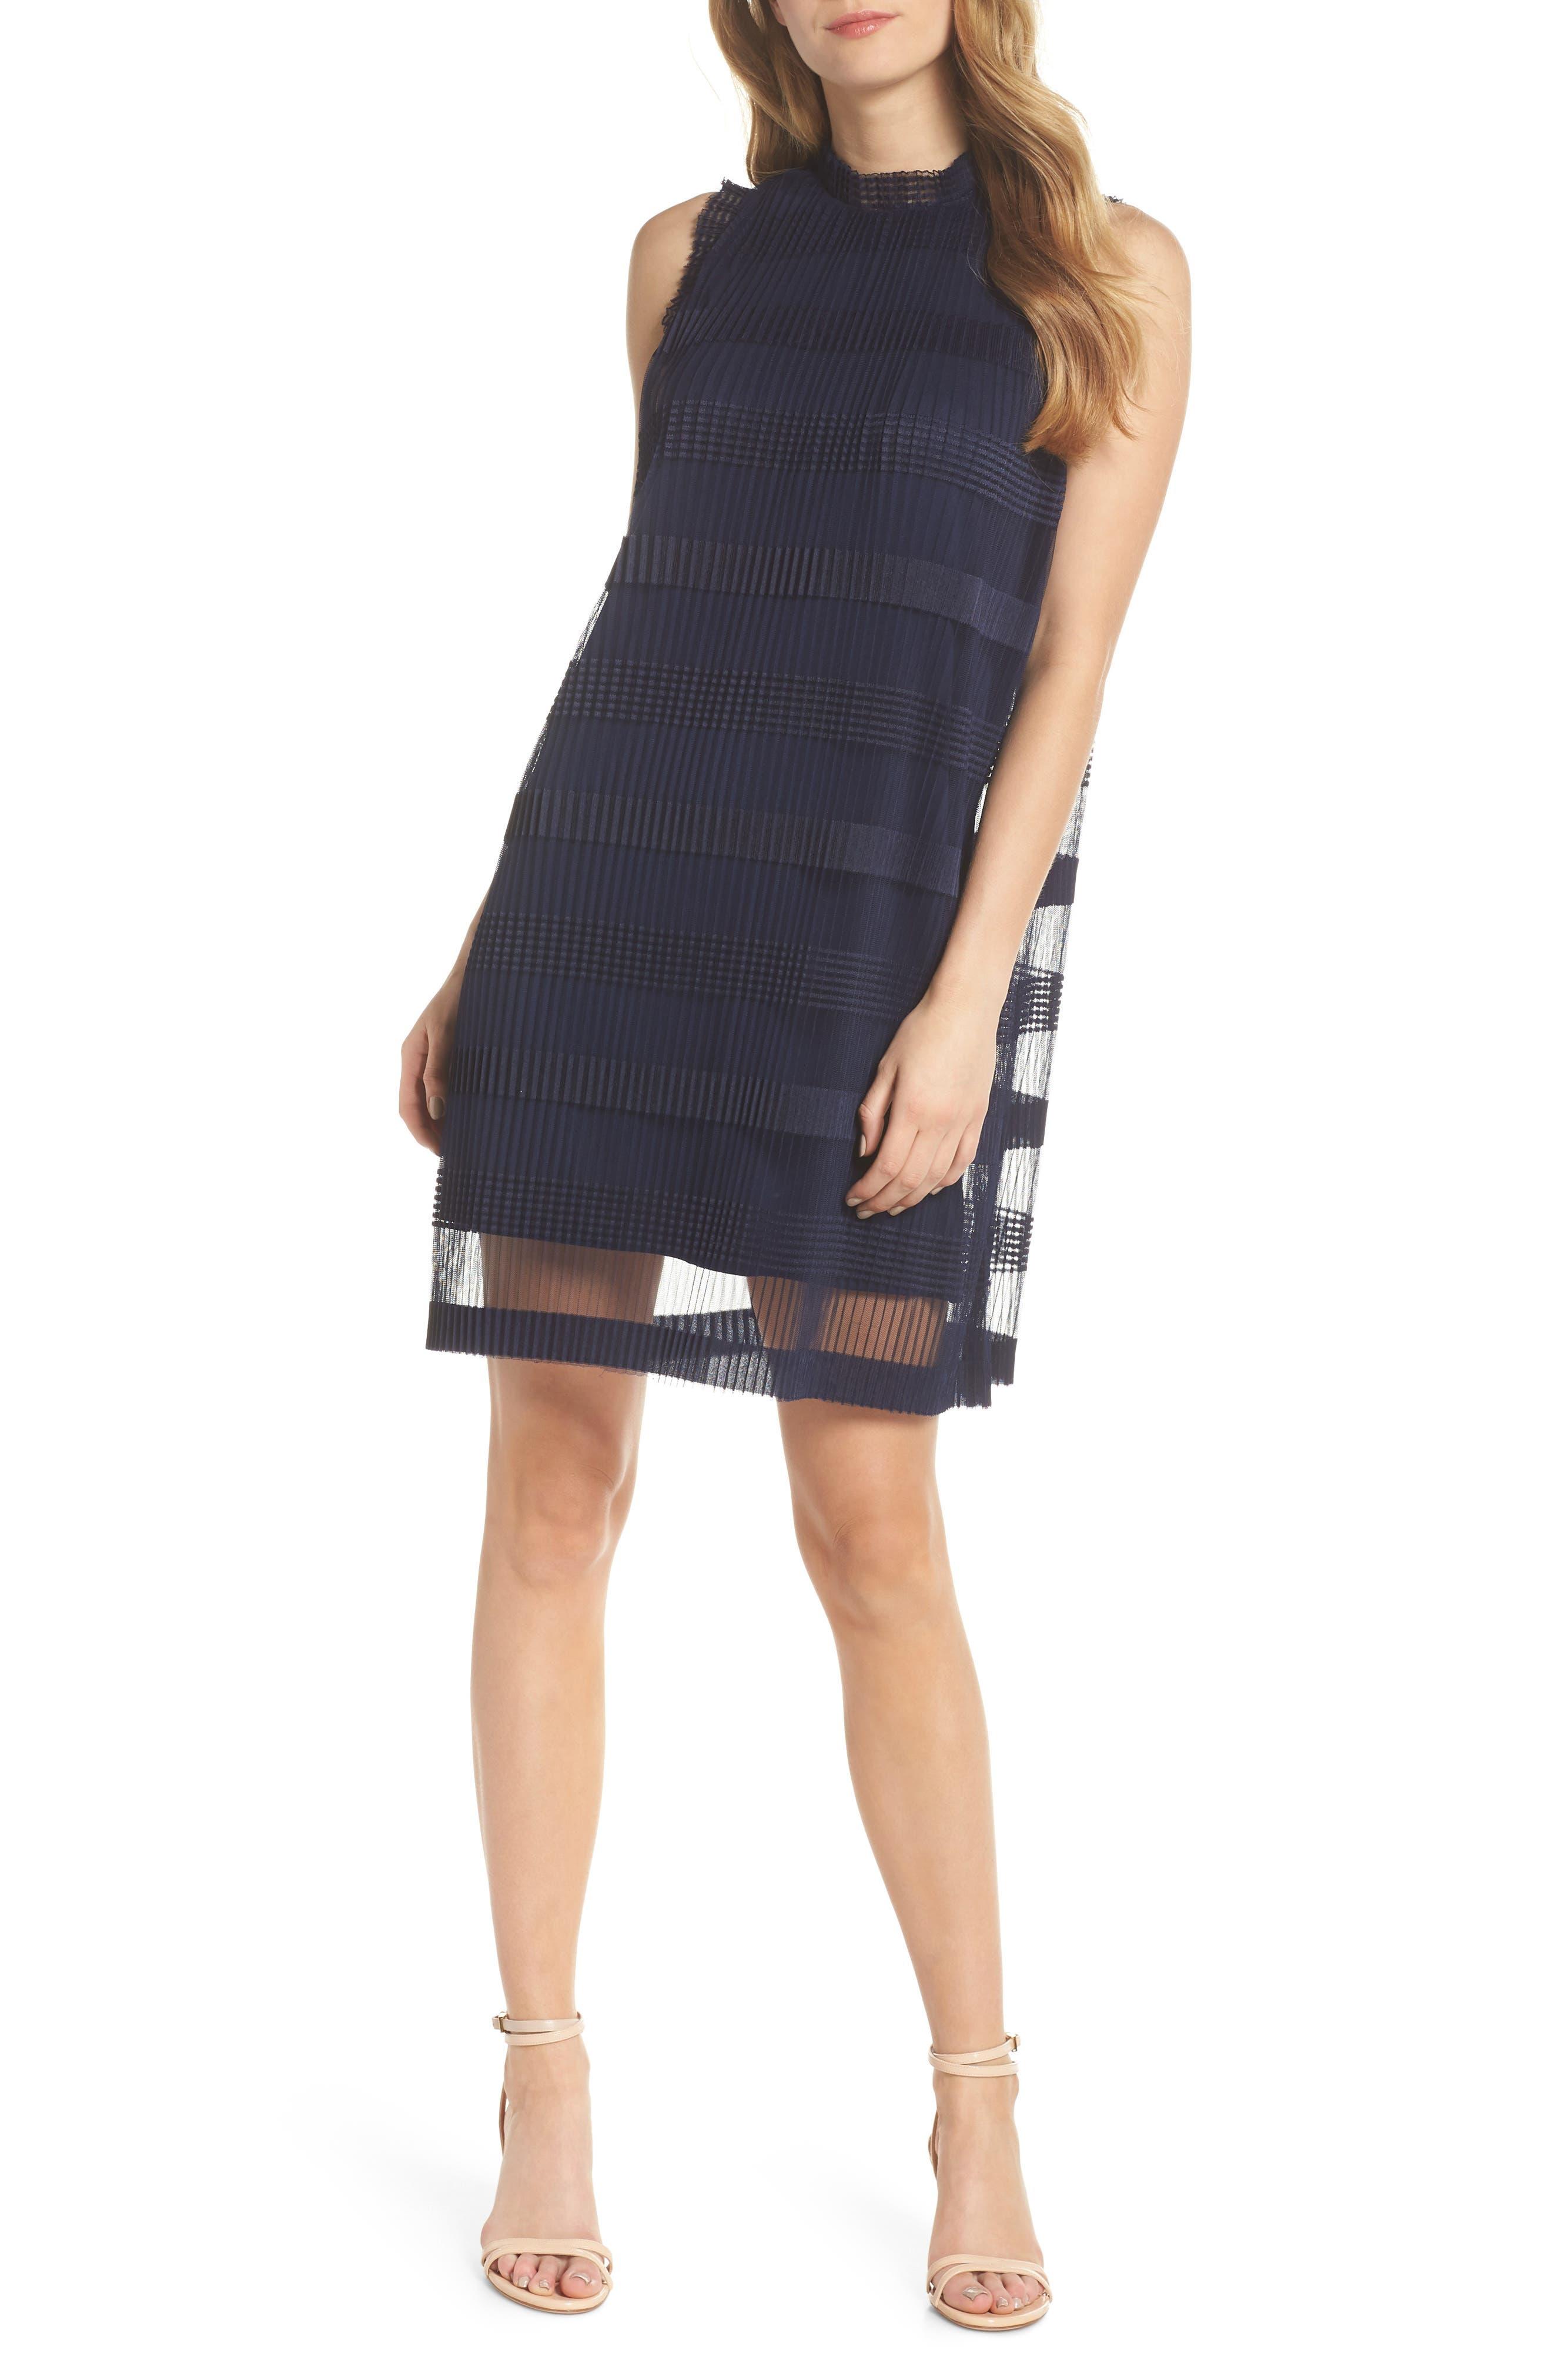 JULIA JORDAN, Stripe Pleated Chiffon Shift Dress, Main thumbnail 1, color, NAVY